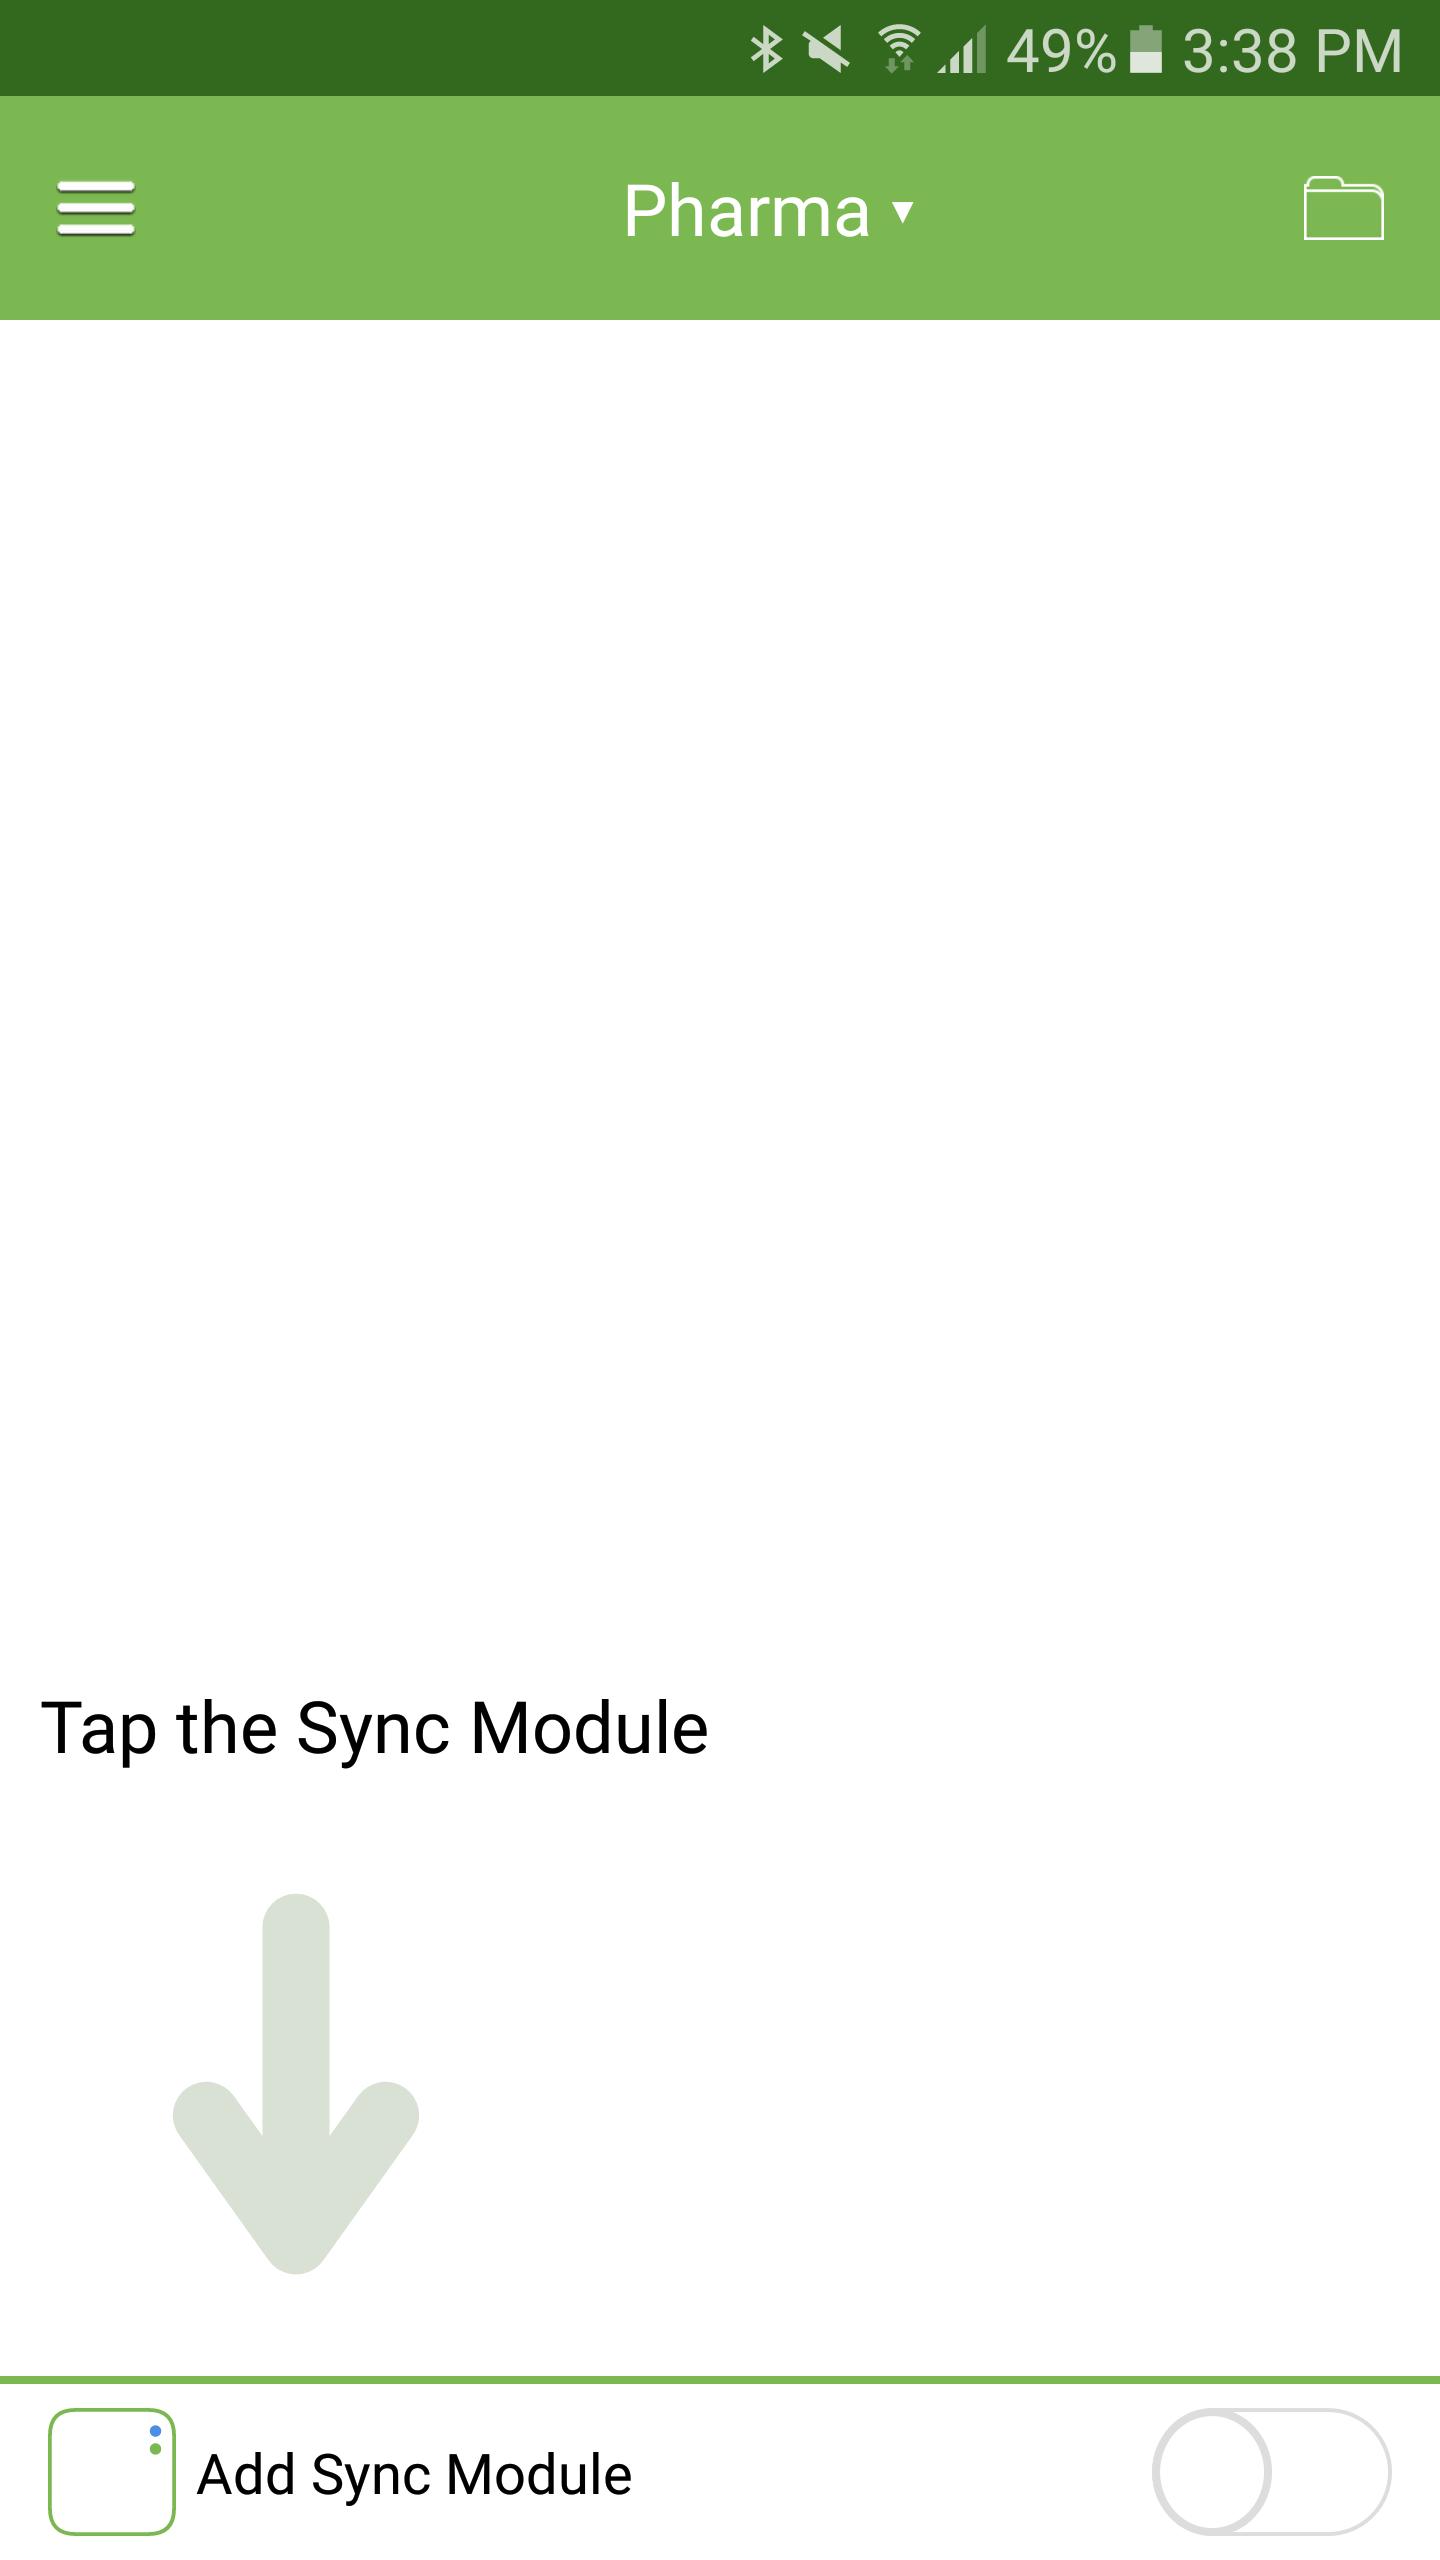 blink-app-setup-sync-module-1